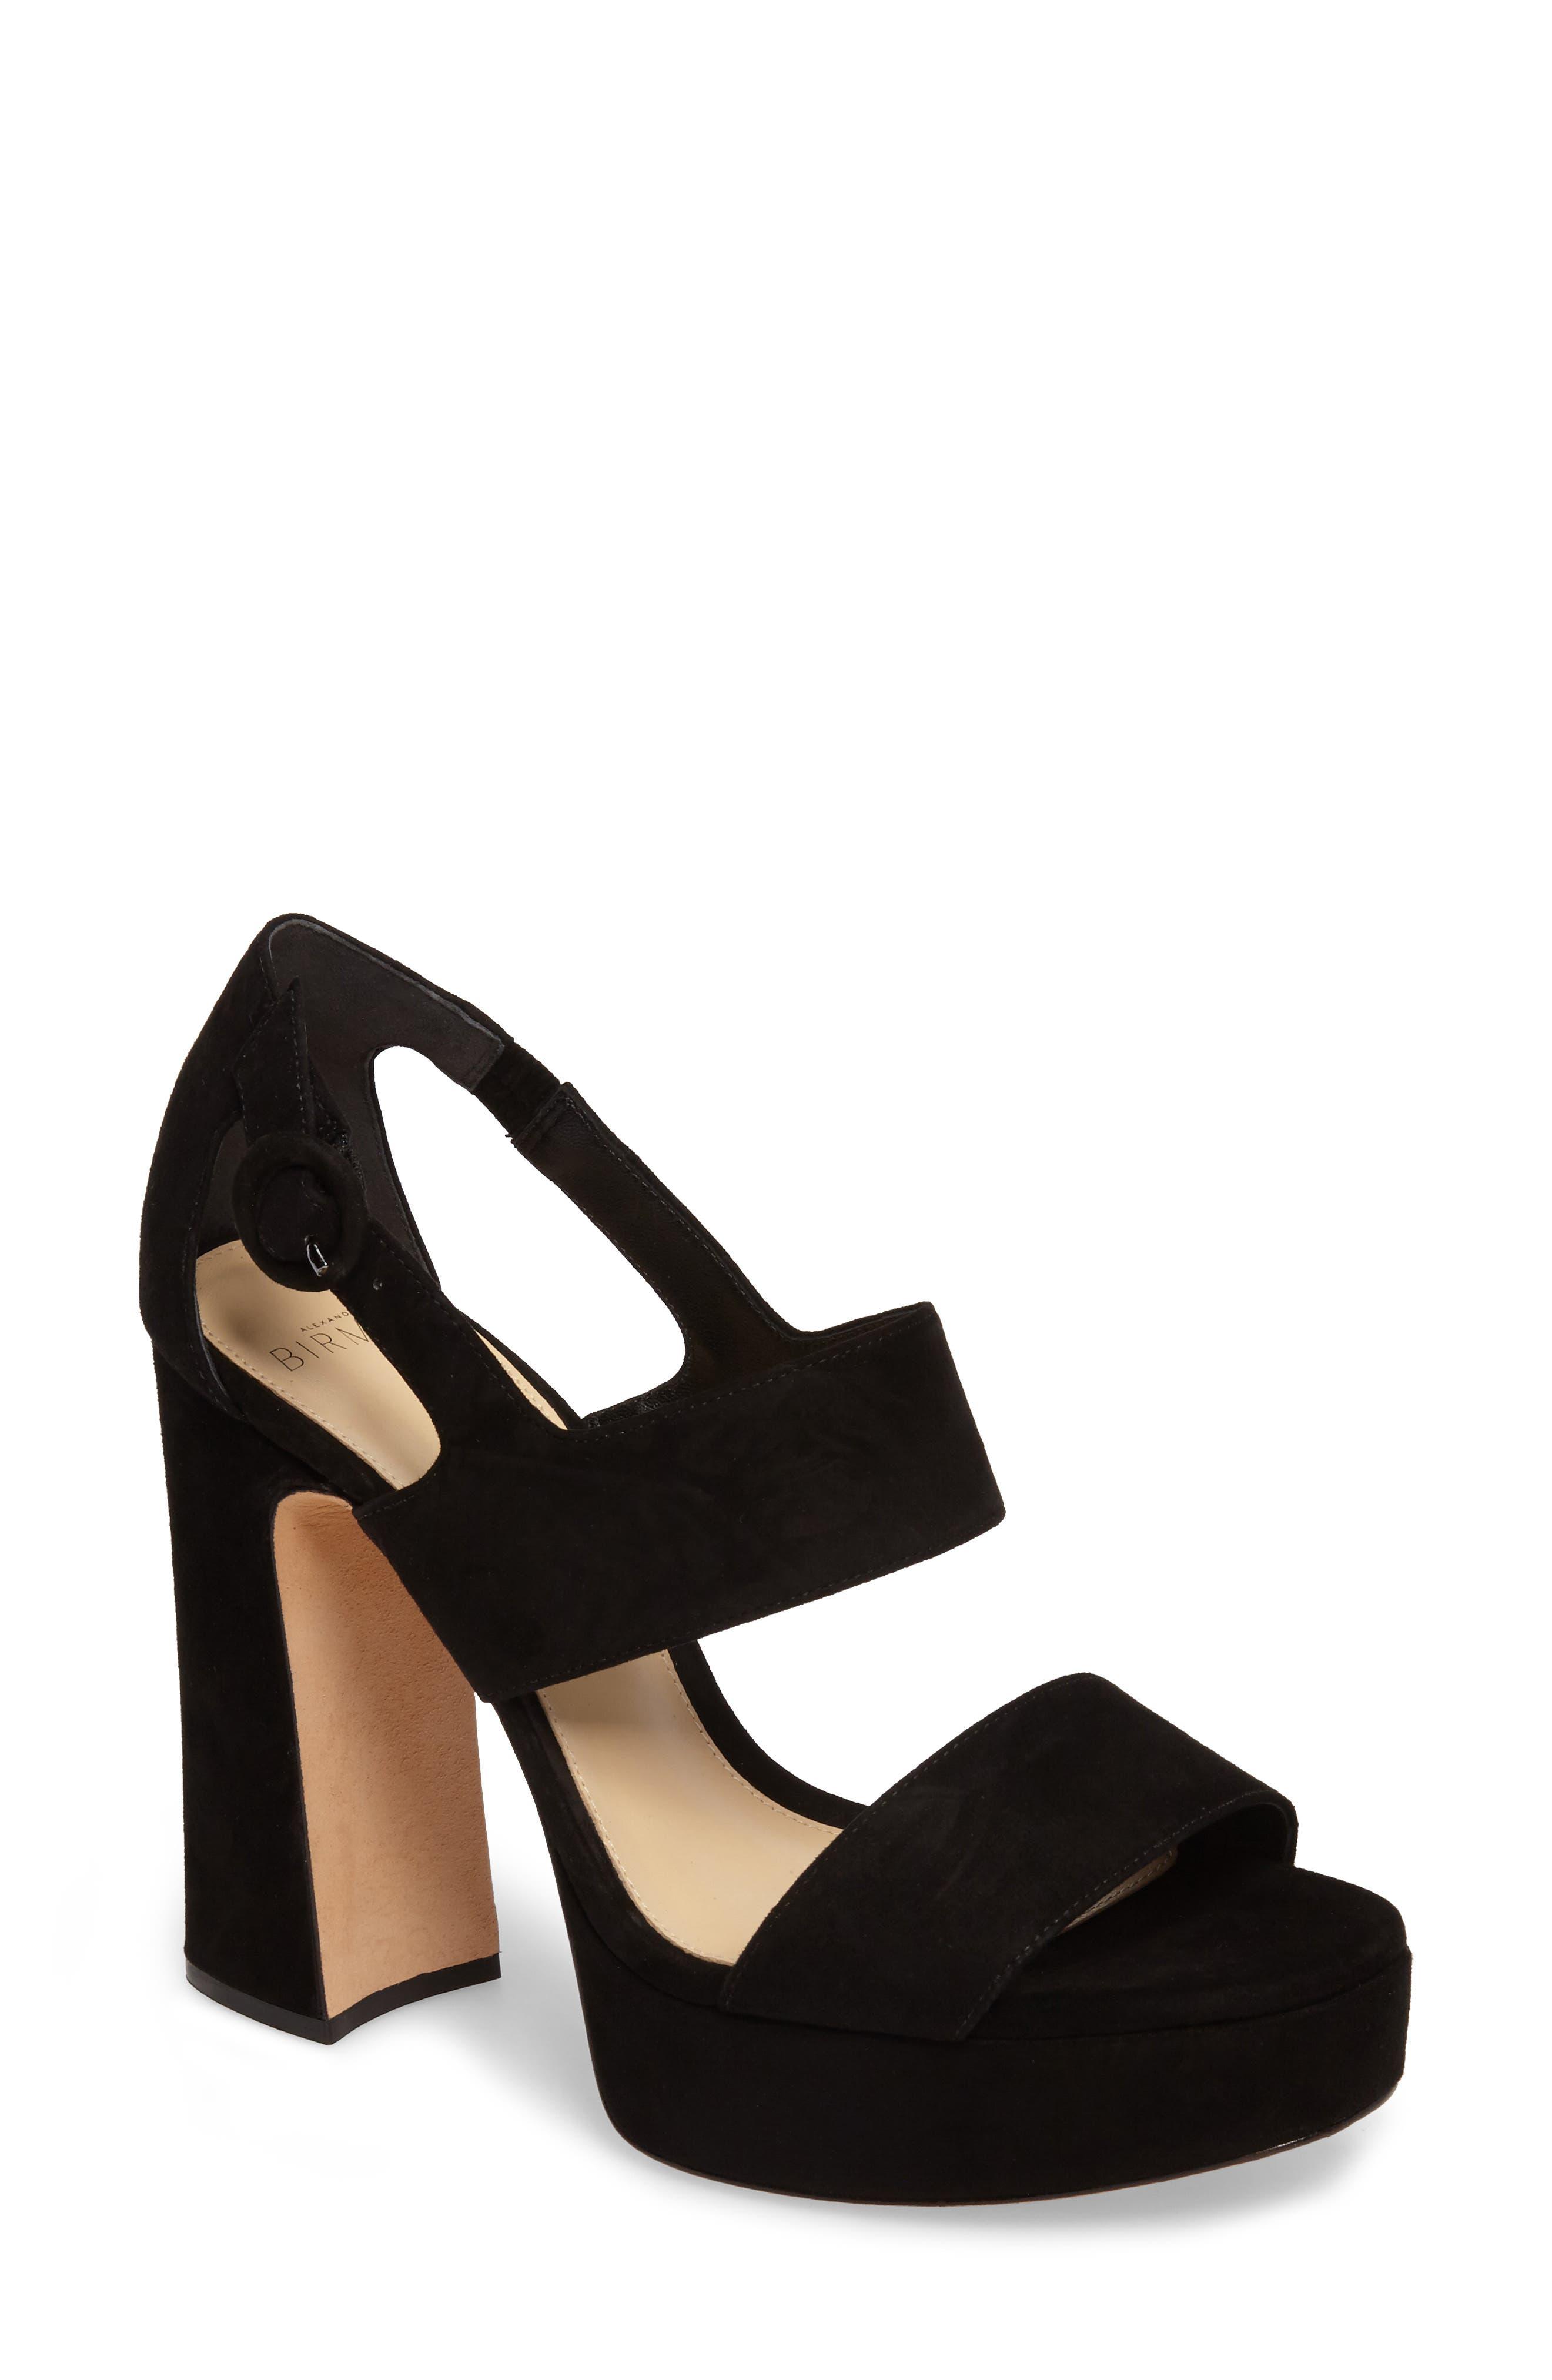 Elouise Platform Sandal,                         Main,                         color, Black